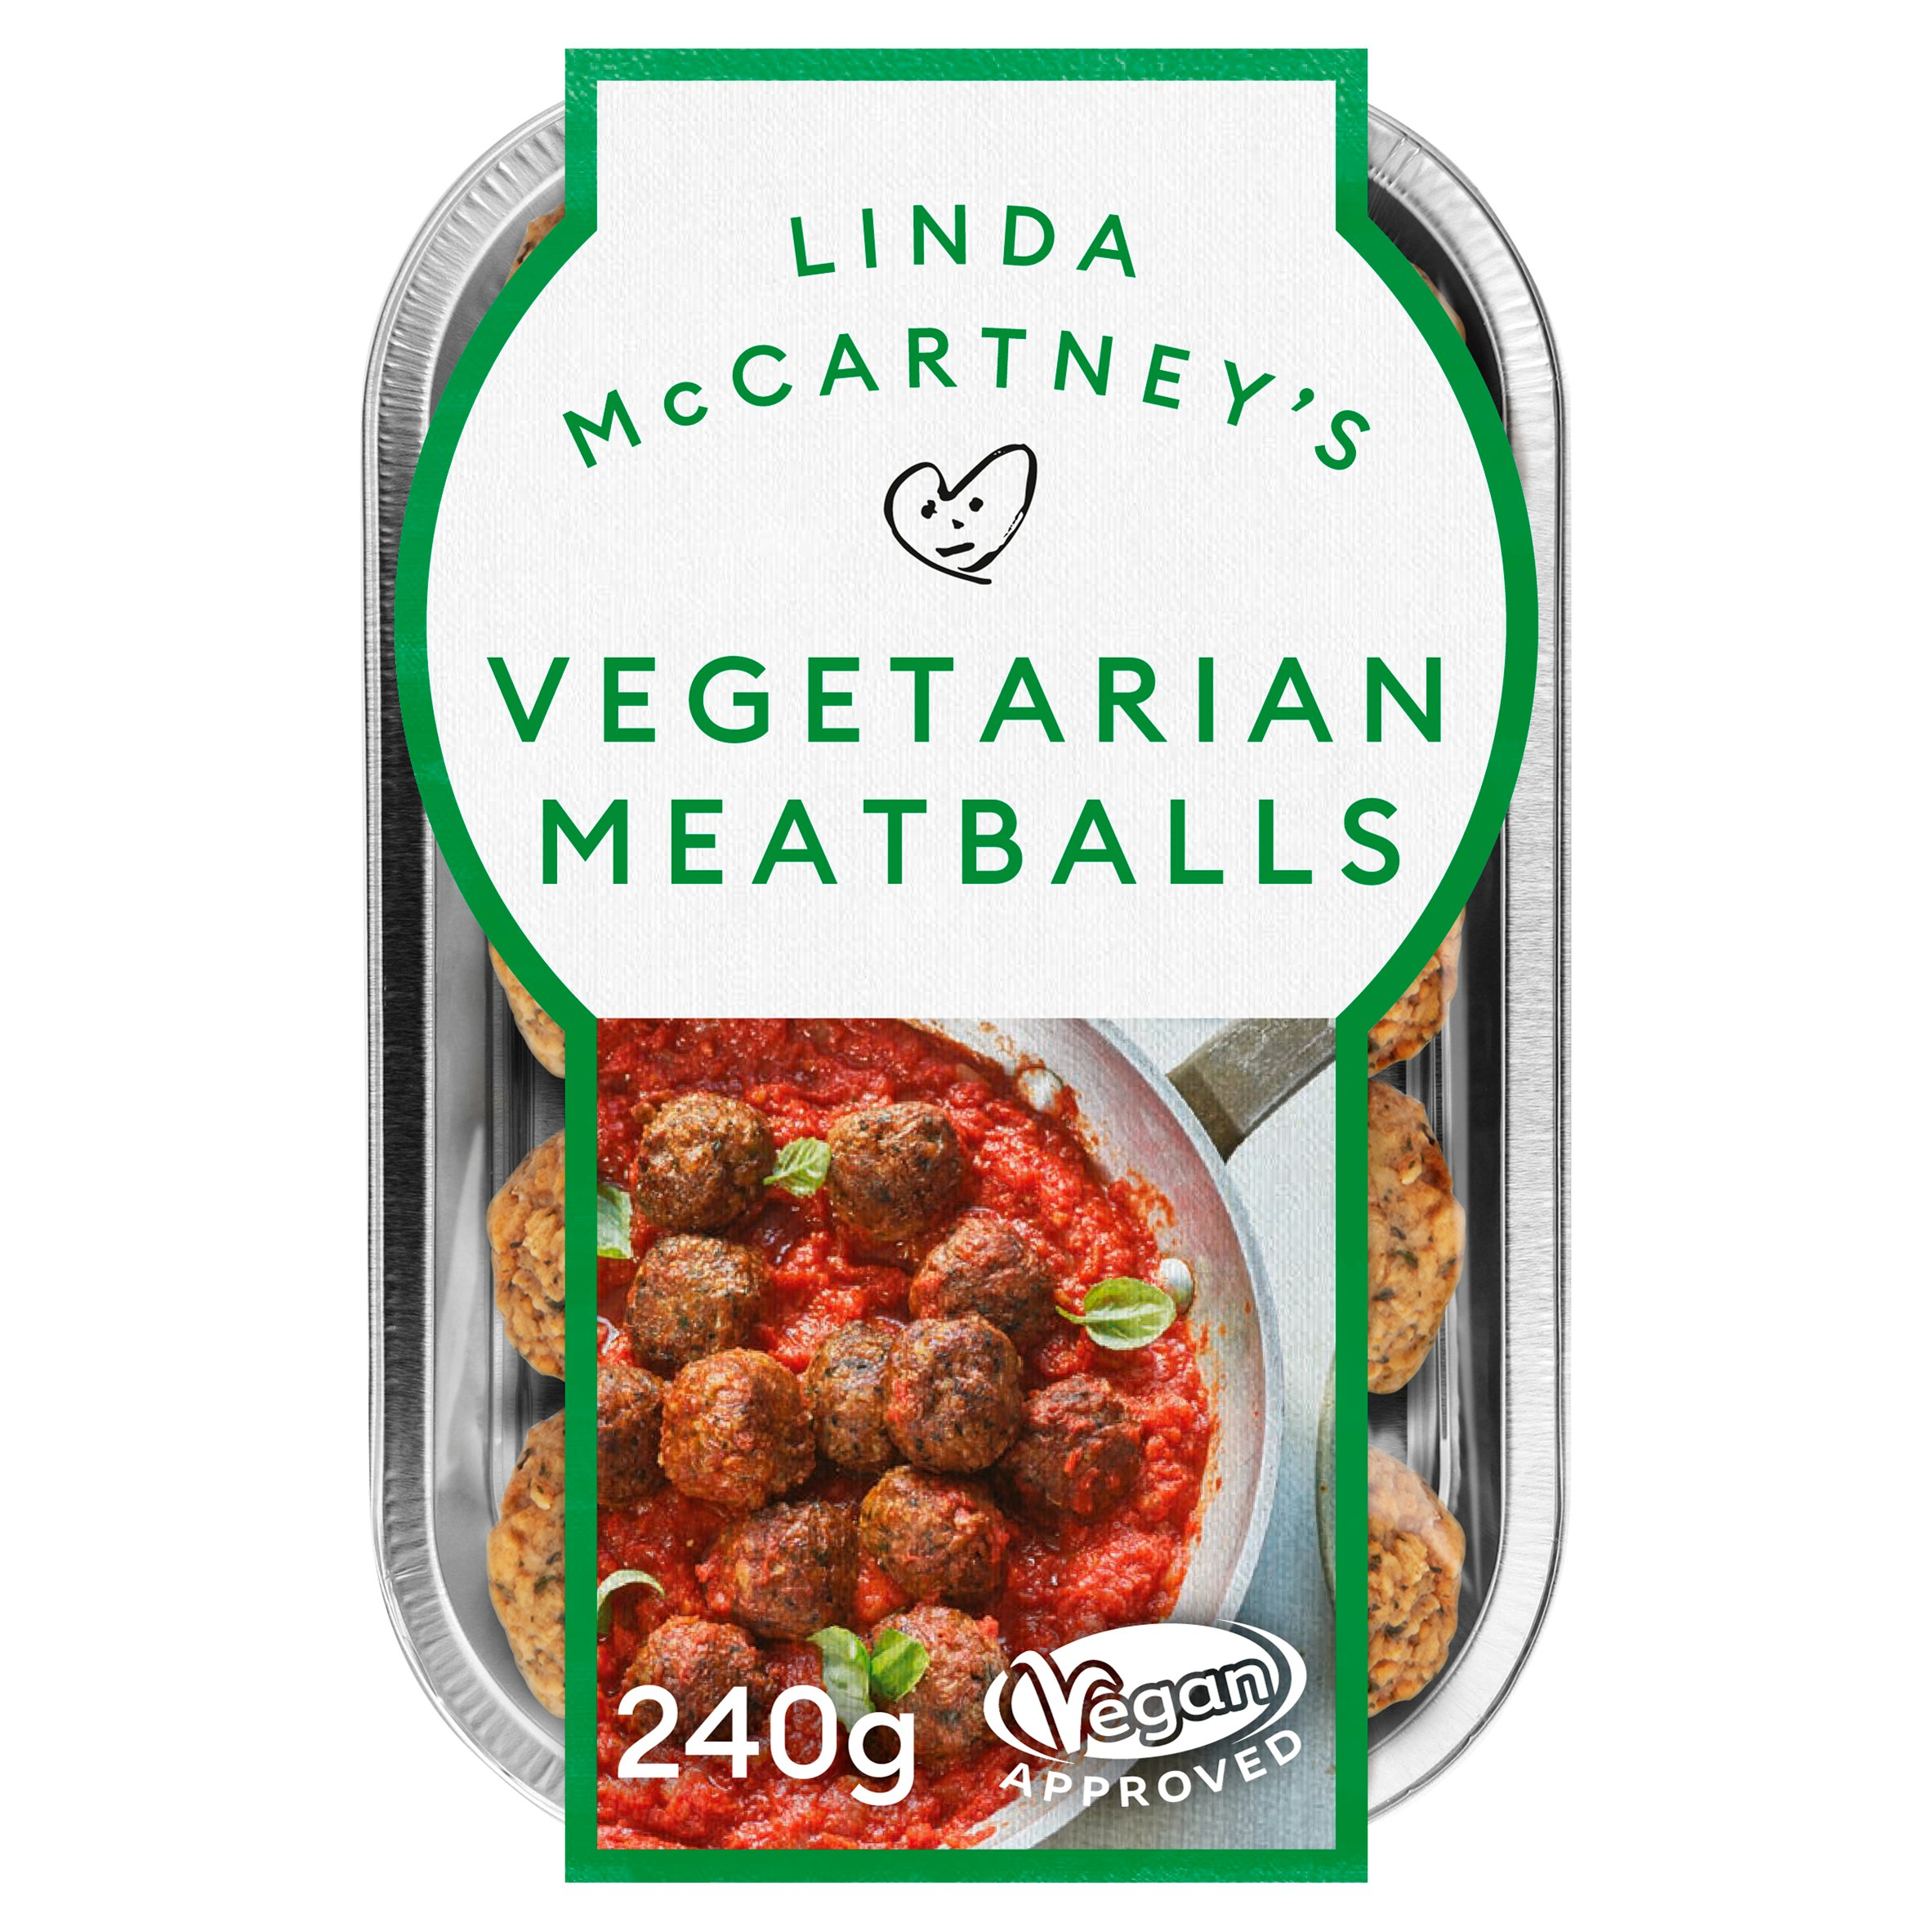 Linda Mccartneys Vegerarian Meatballs 240G